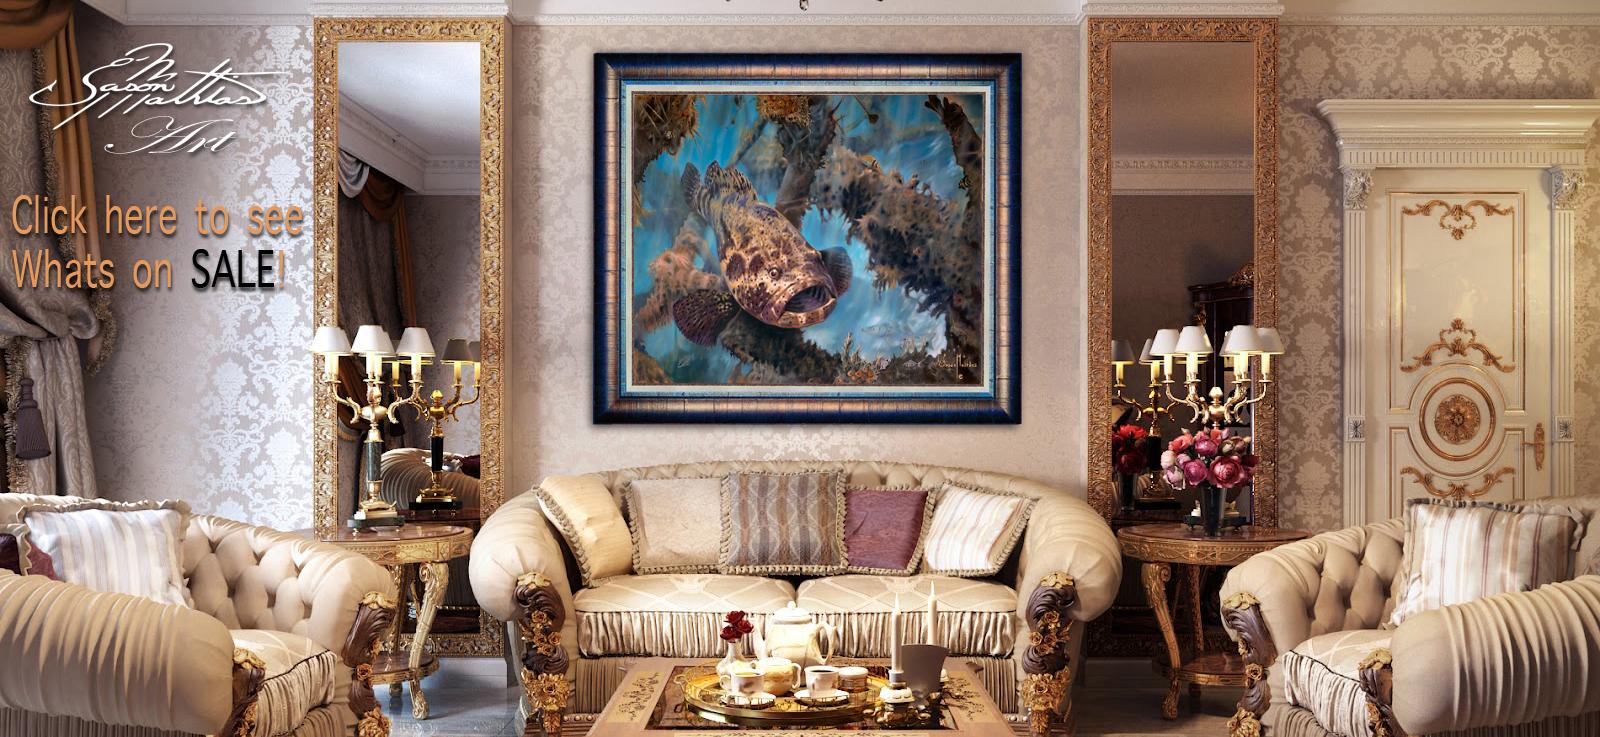 Jason Mathias Art, Gamefish art, Sportfish art, outdoor products, gifts, wall art, fine art, fish art, prints, originals, fishing art, posters, sale